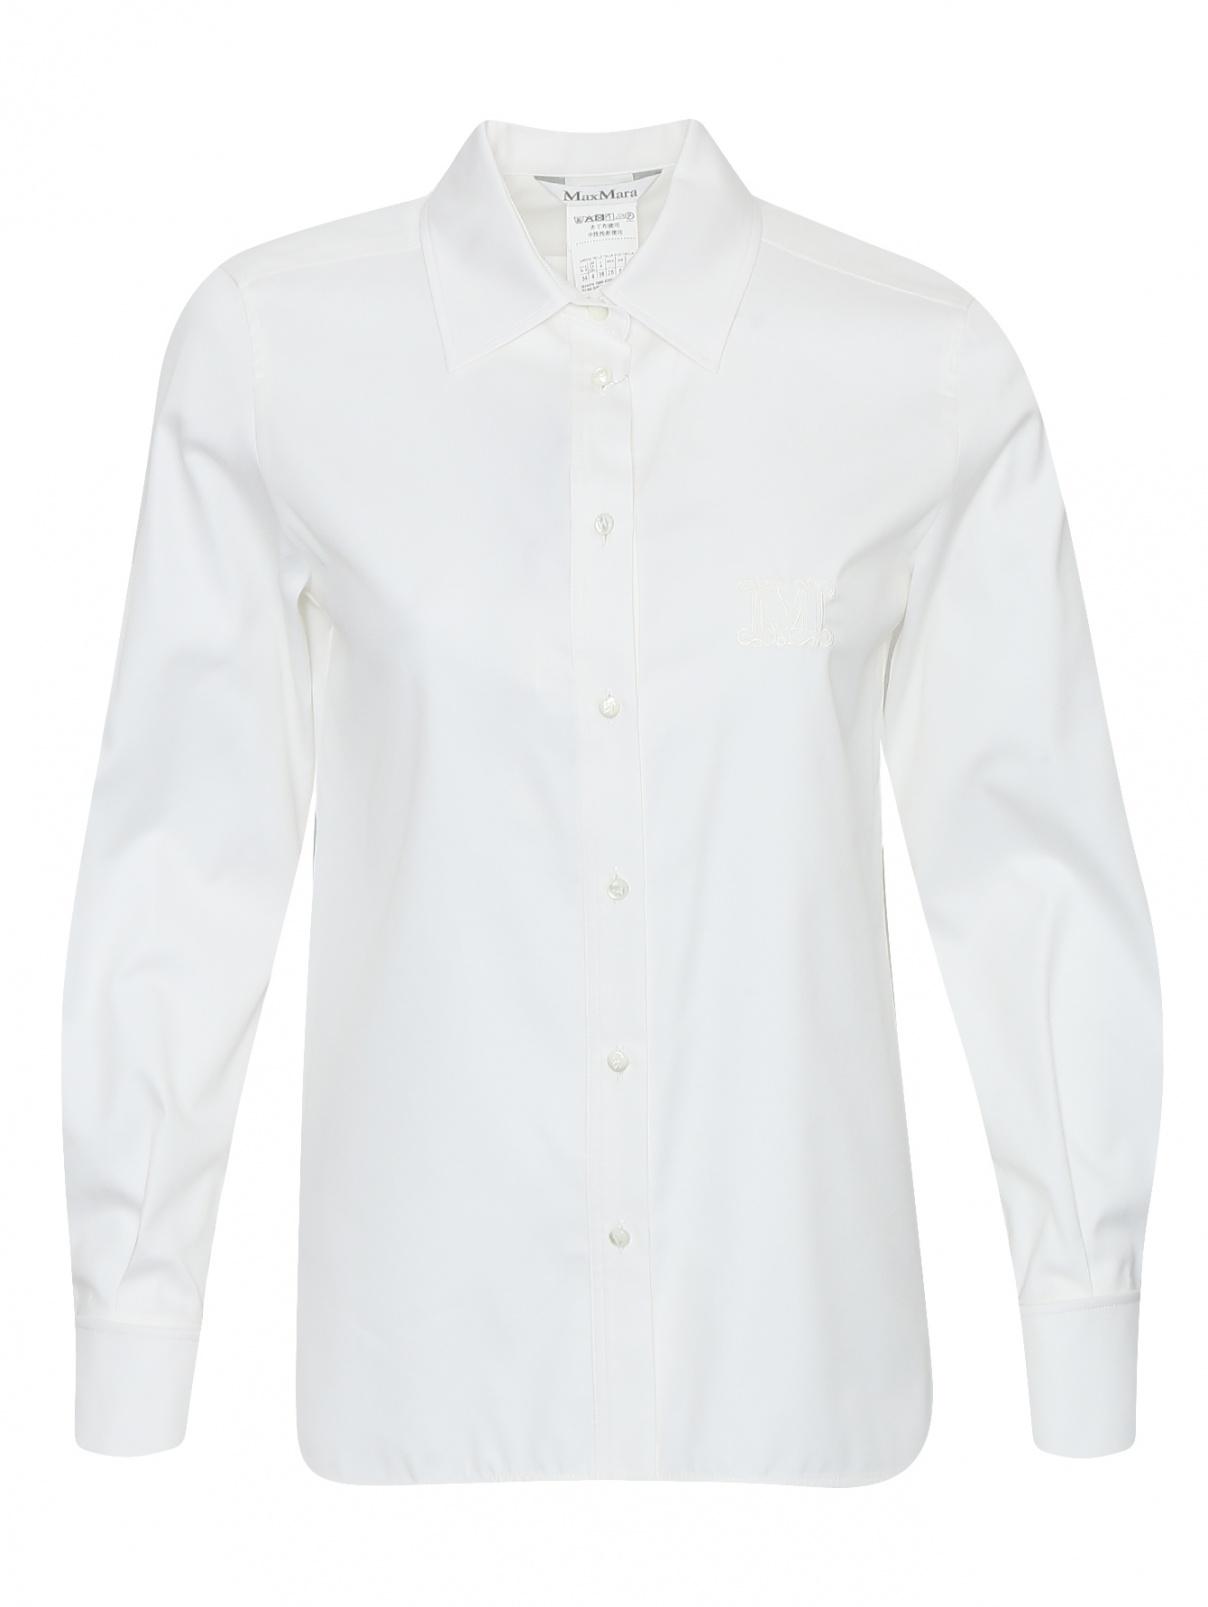 Блуза из хлопка и шелка Max Mara  –  Общий вид